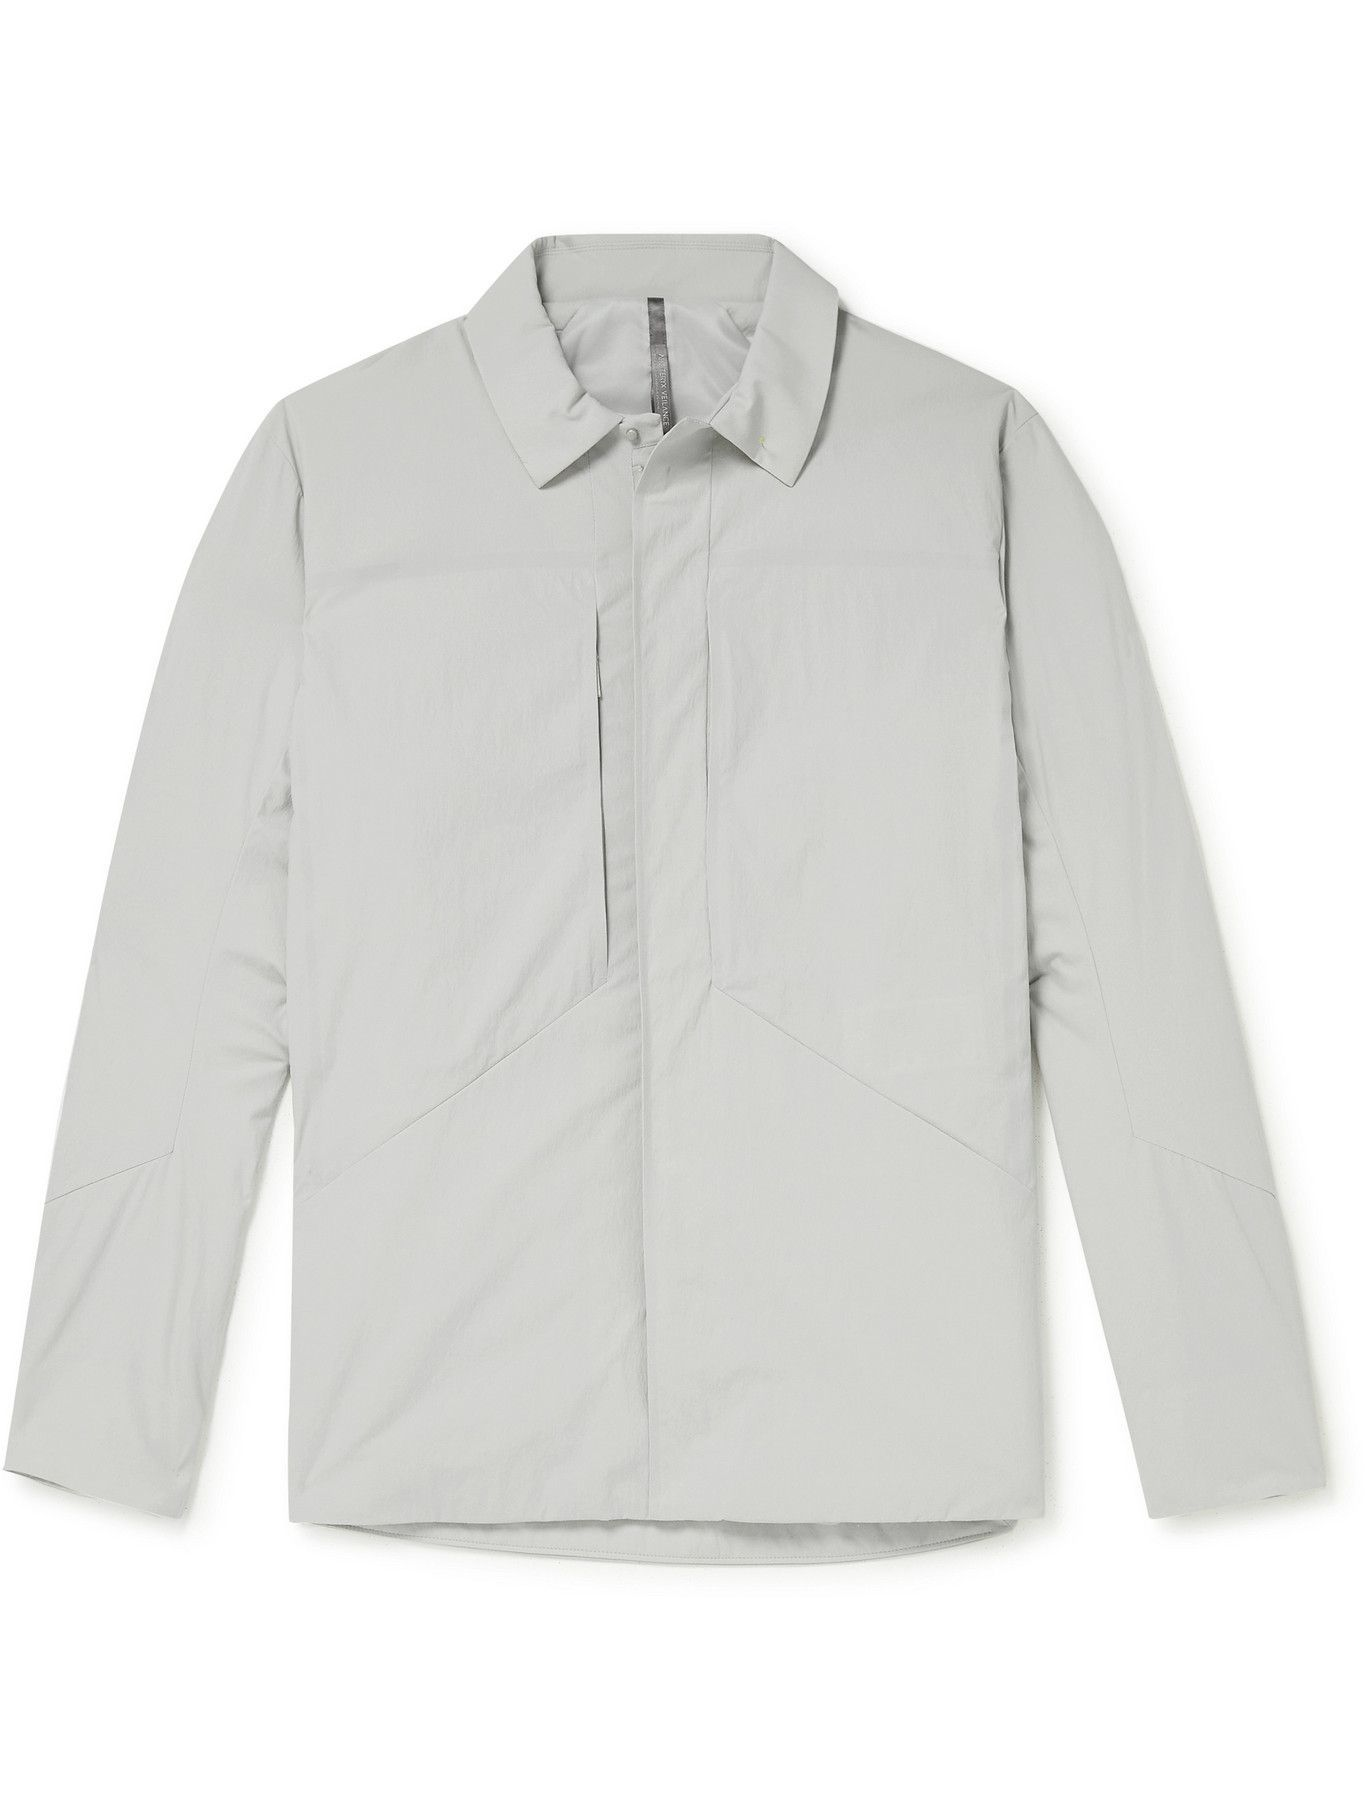 Photo: Veilance - Mionn Padded TerraTex Overshirt - Gray